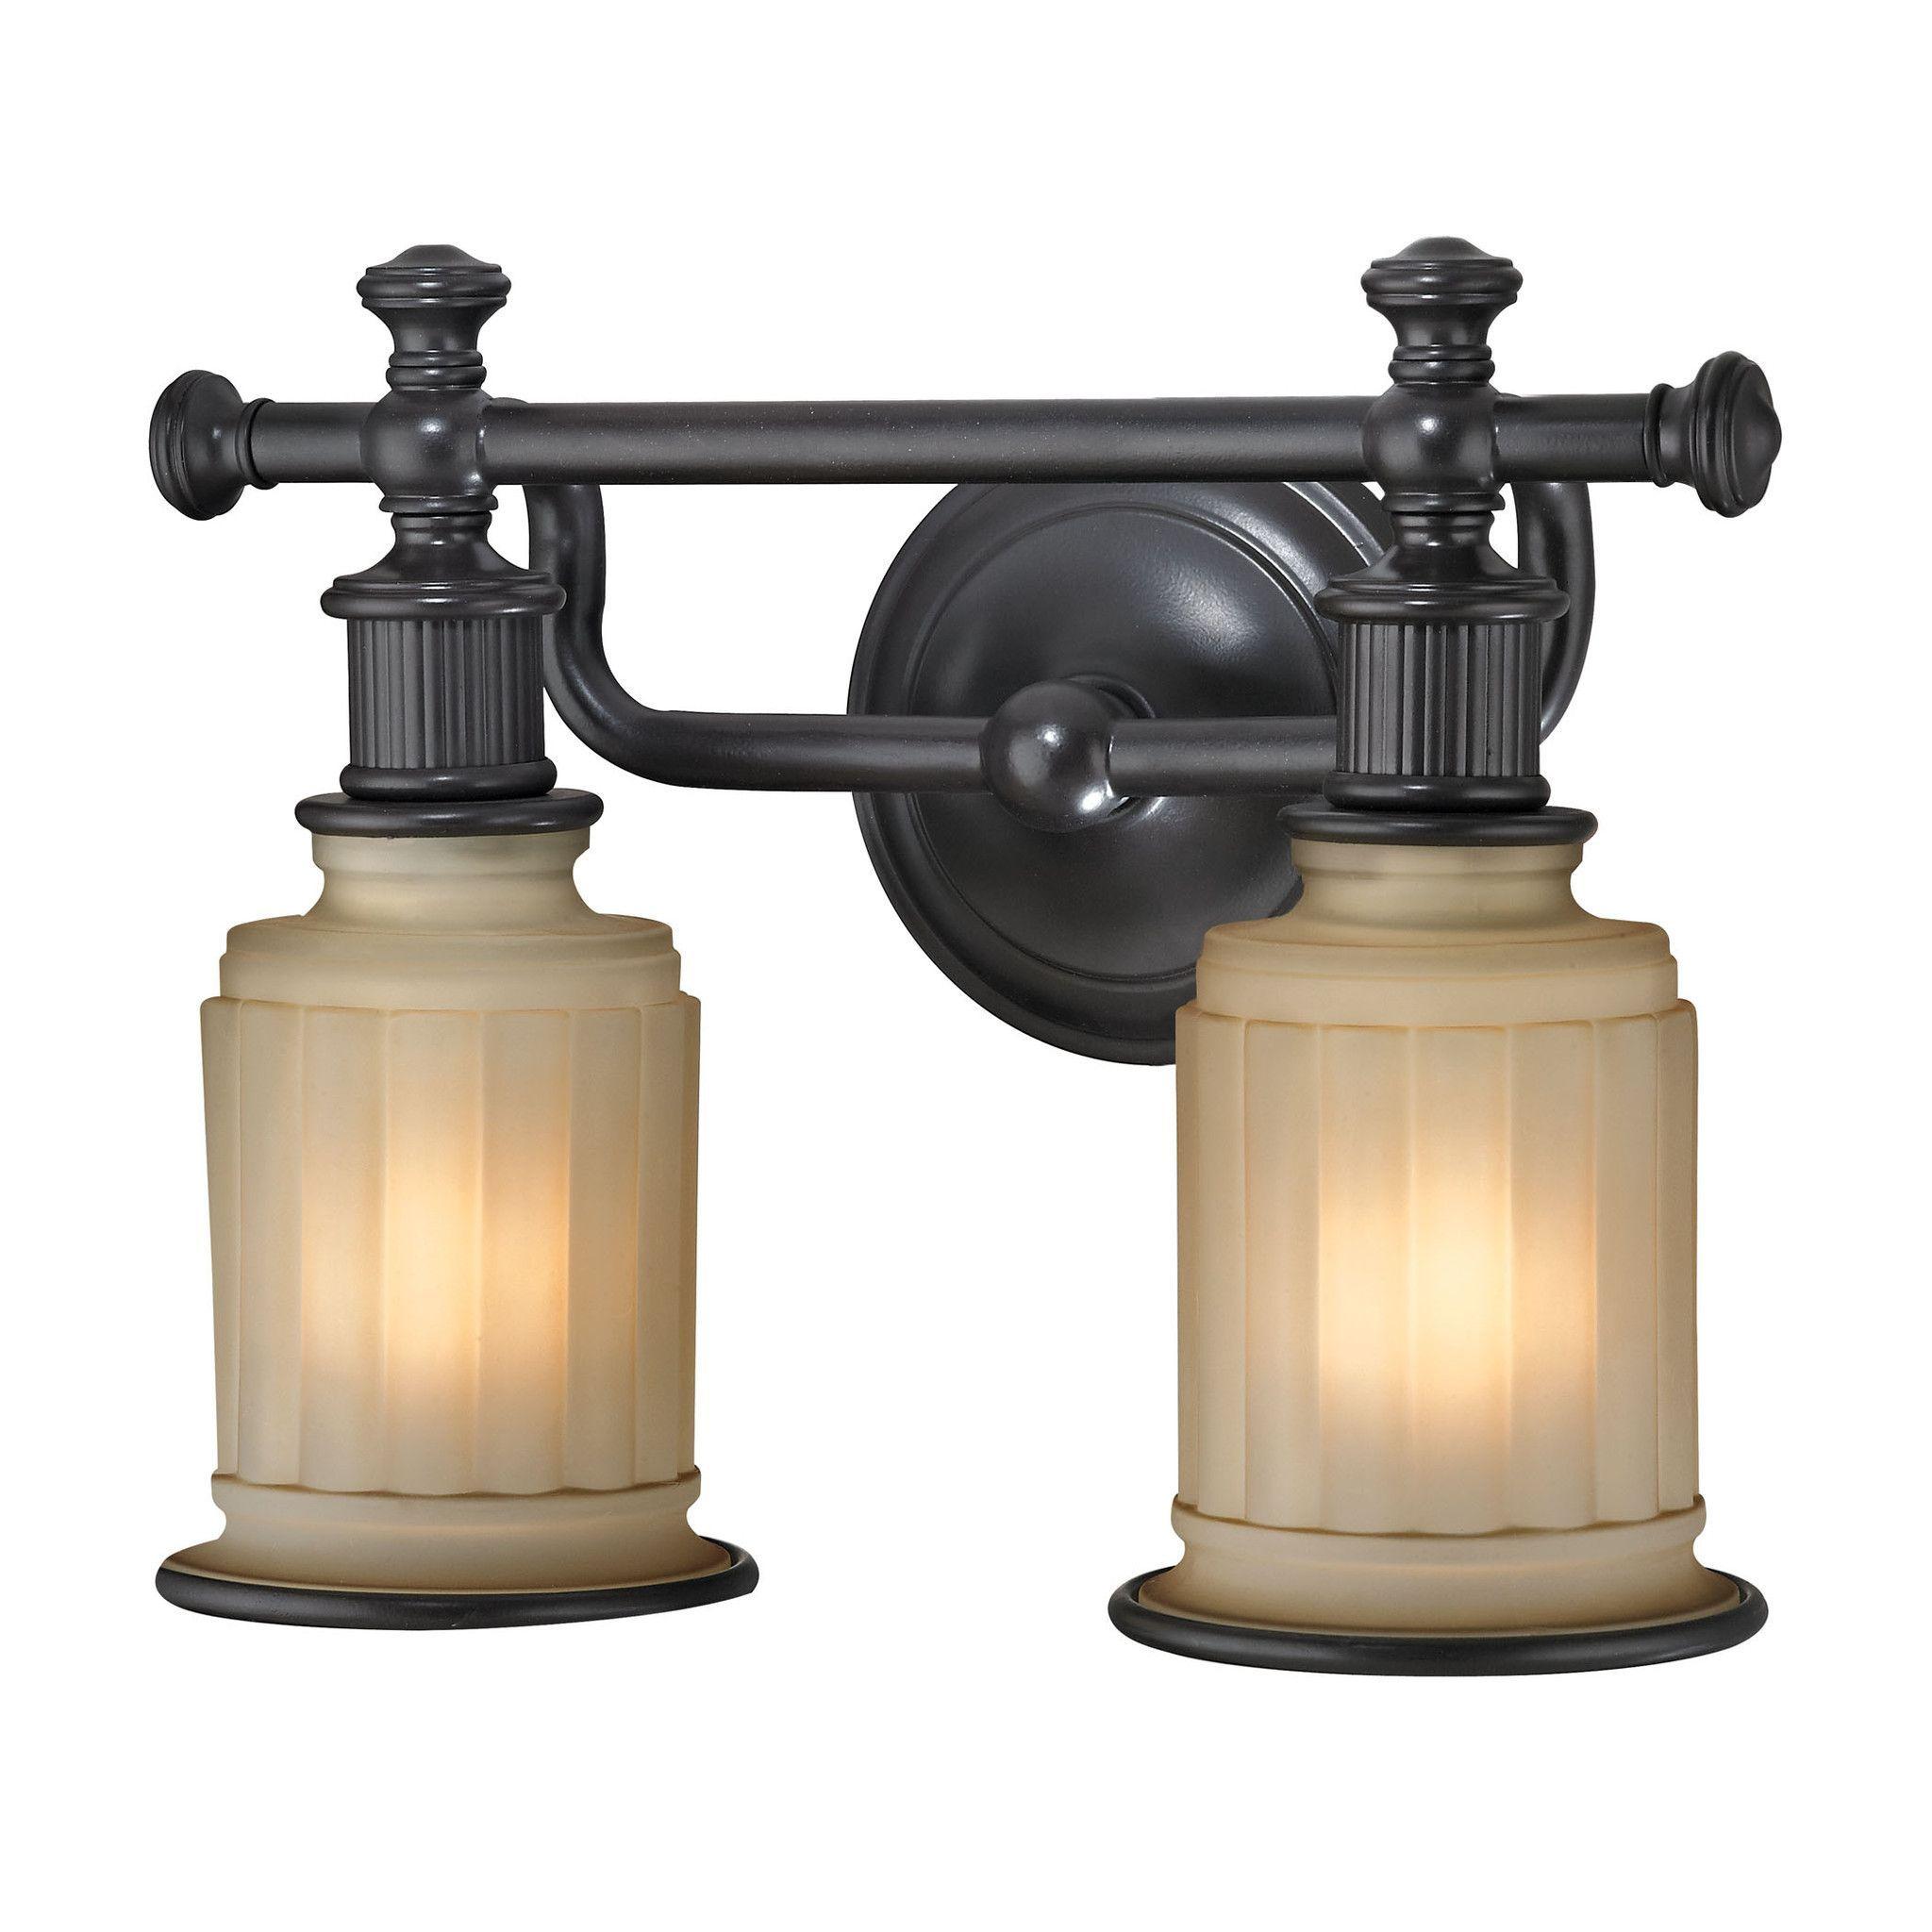 oil wide maxim fixture essentials bathroom the light fixtures from bronze pin rubbed collec